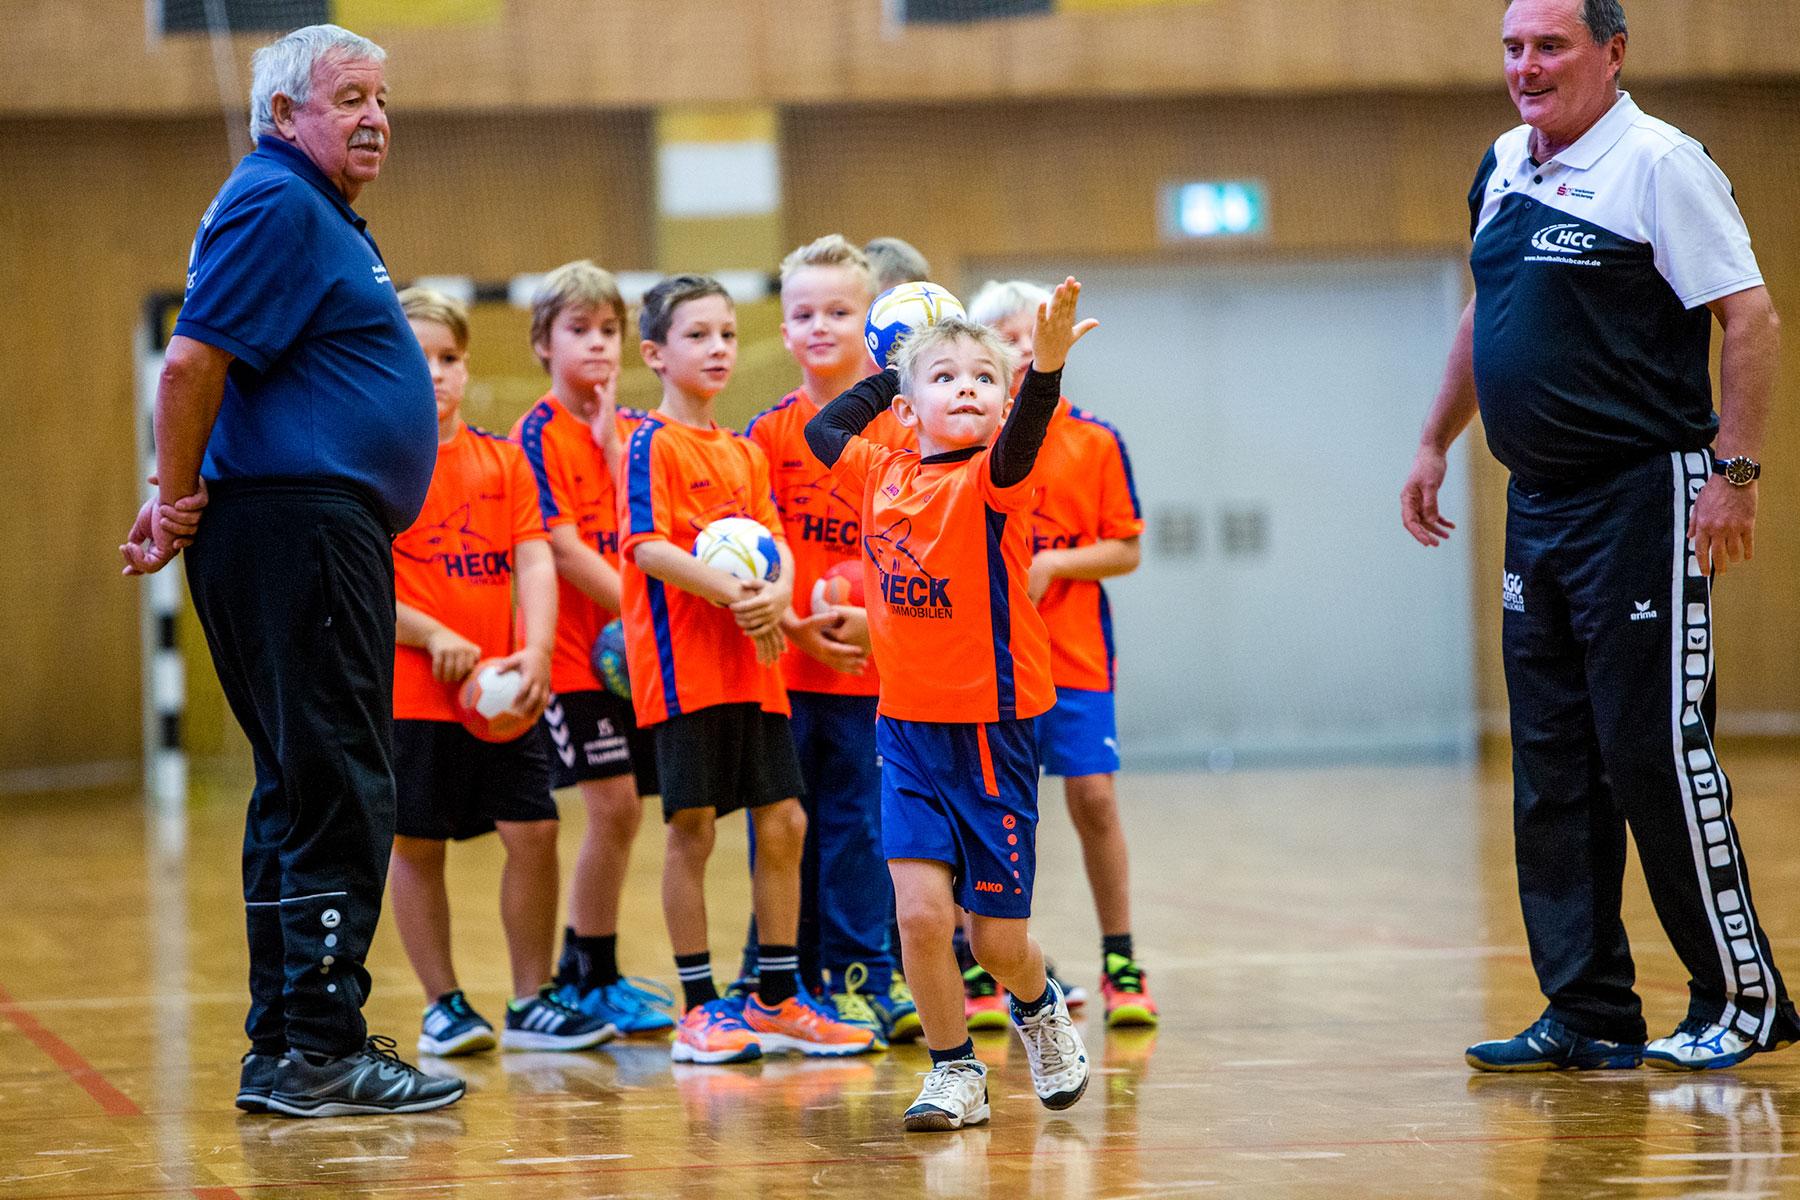 201809_Handballcamp_NDH (24)